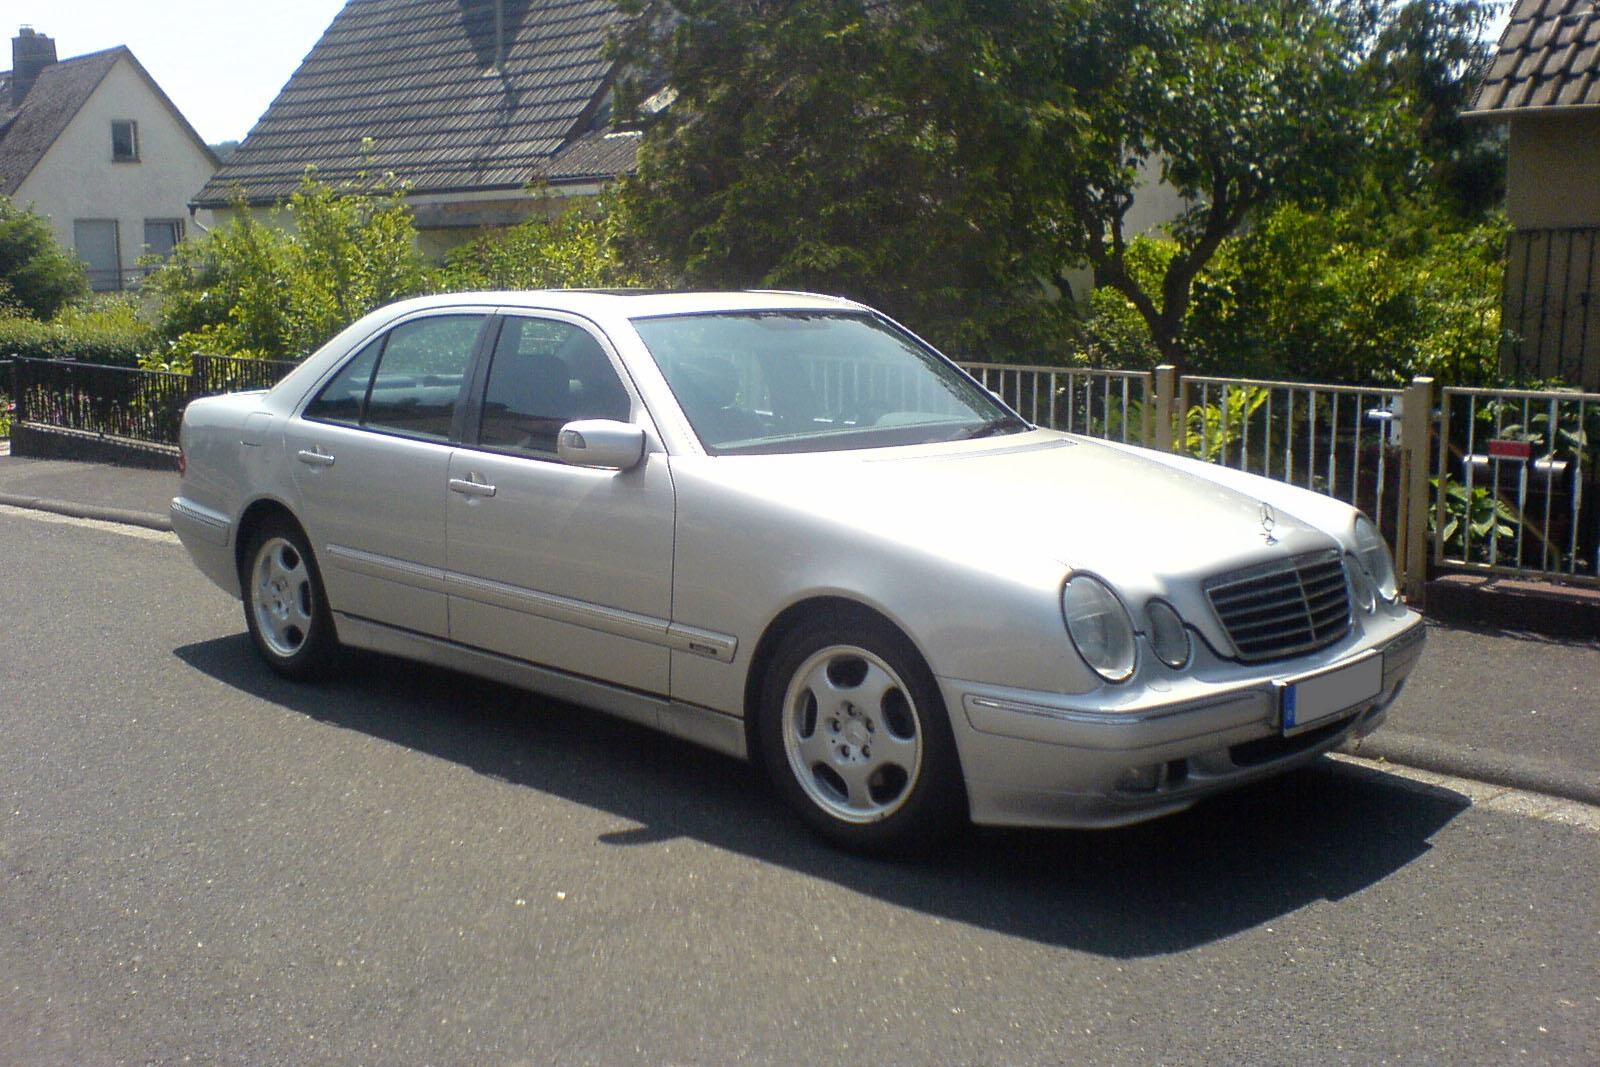 Mercedes W 210 >> File:Mercedes W210 Avantgarde silber vr.jpg - Wikimedia Commons